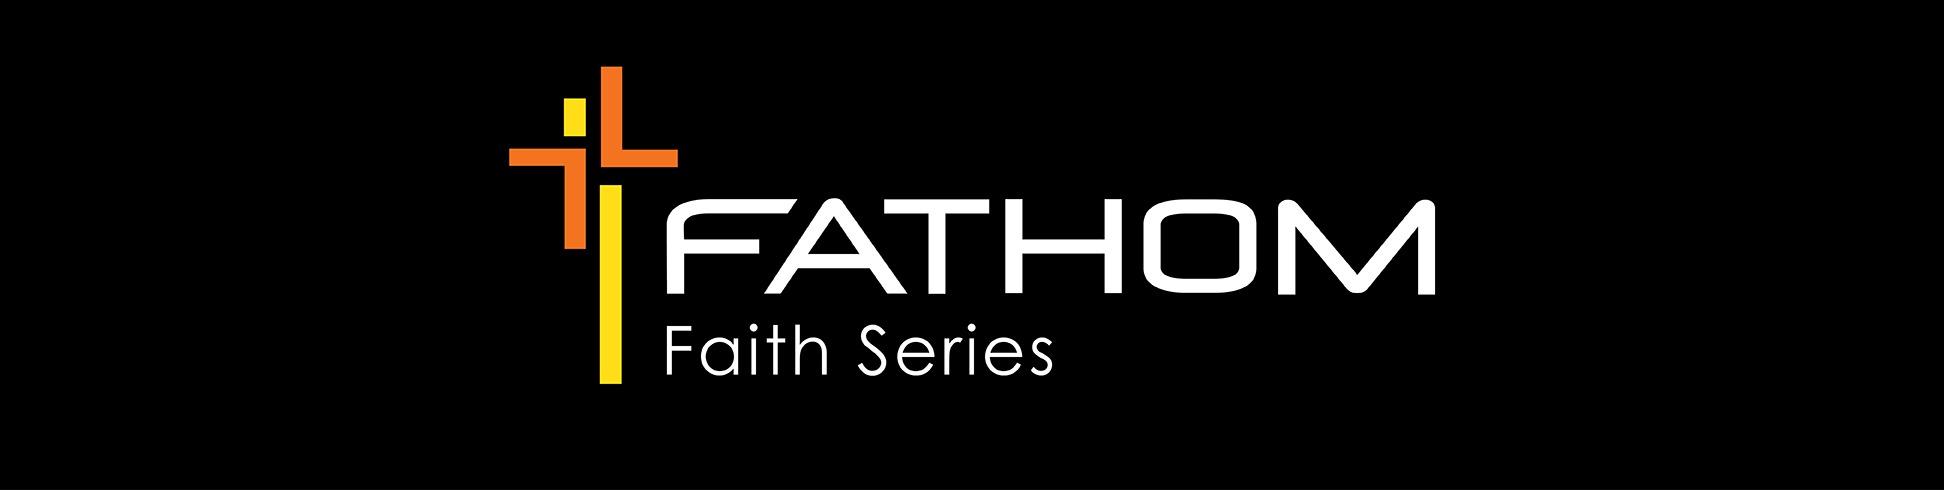 Fathom Faith Series